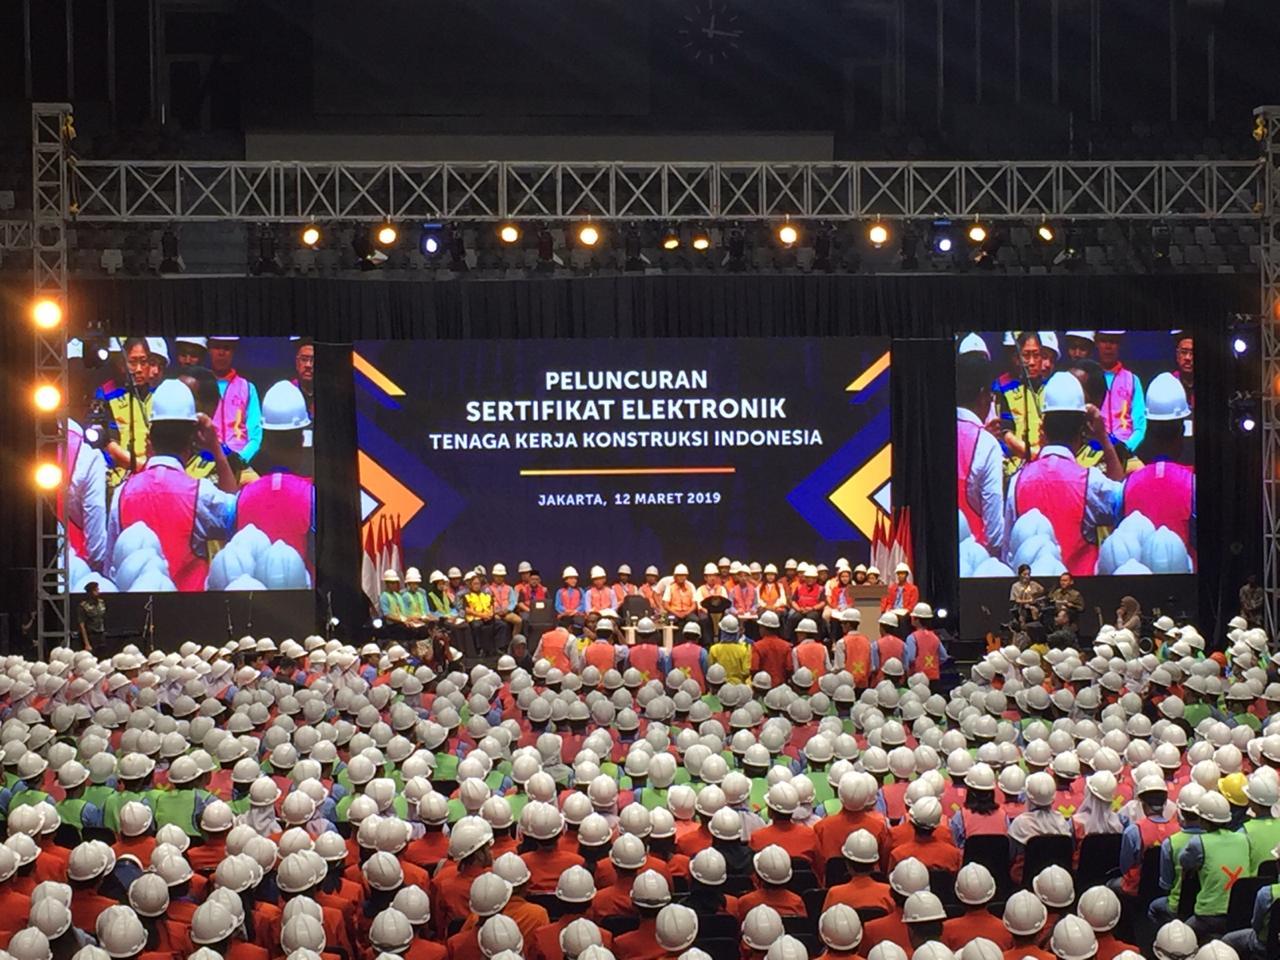 https: img-k.okeinfo.net content 2019 03 12 470 2028879 bahagianya-presiden-jokowi-bagikan-16-000-sertifikat-tenaga-kerja-konstruksi-tLH8pGMA46.jpg